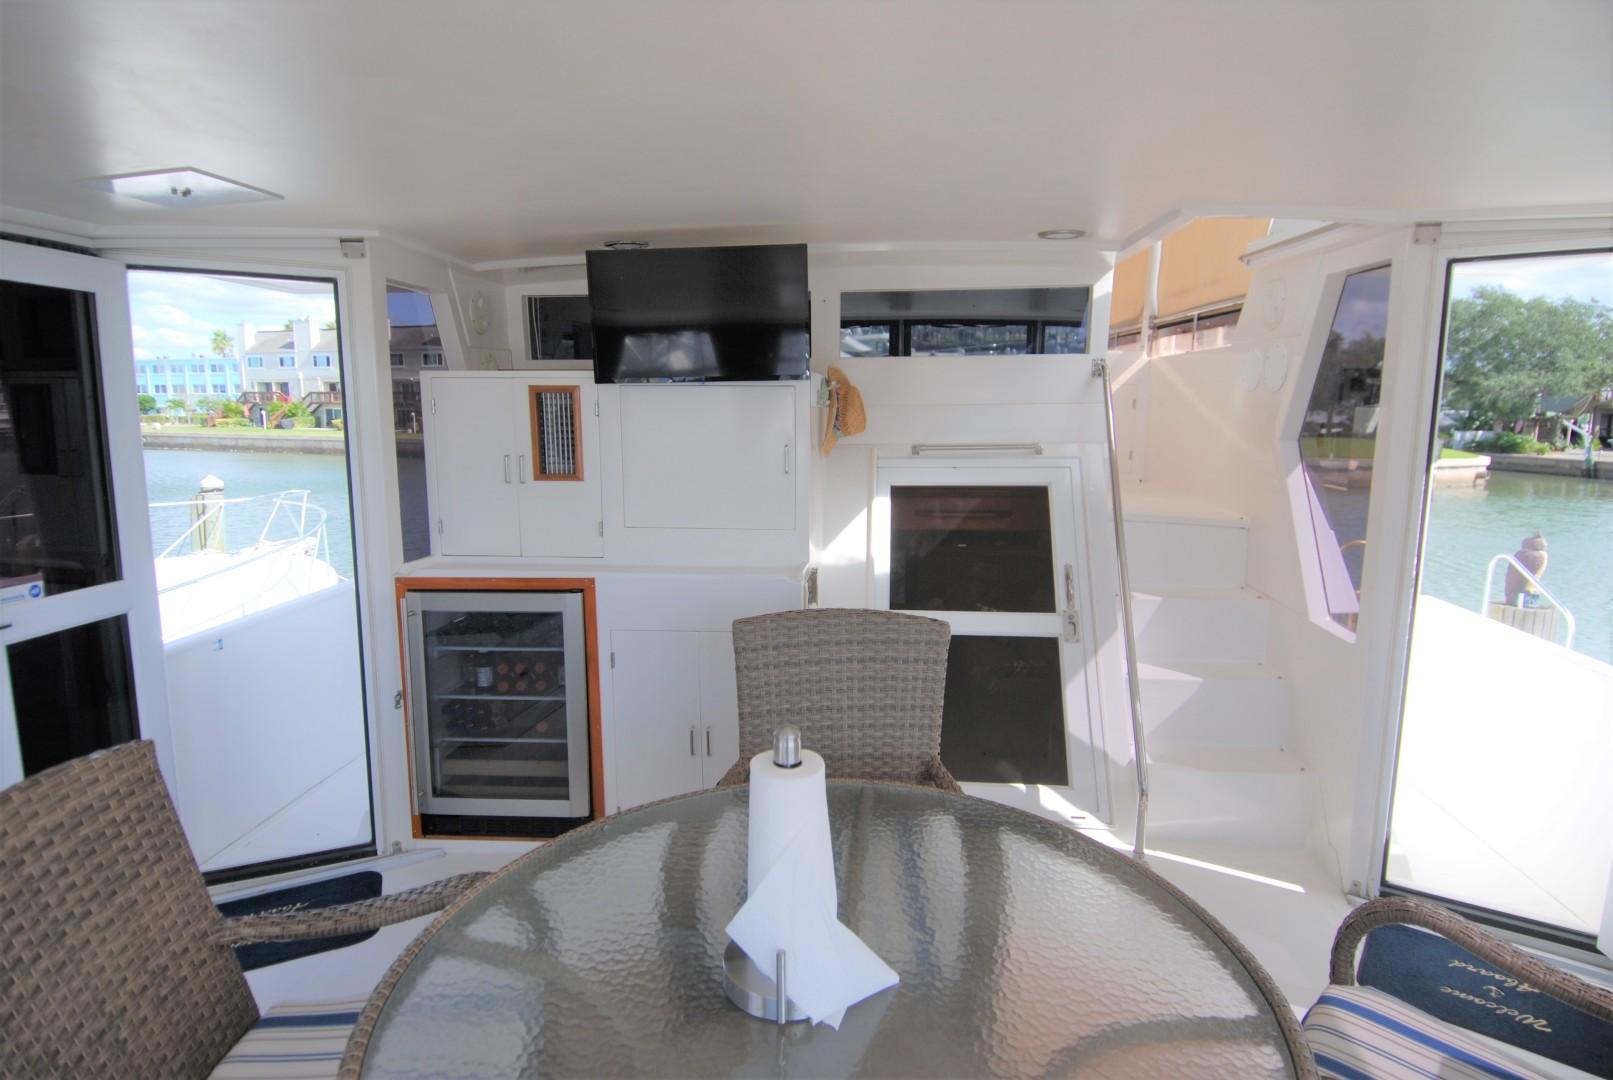 Novatec-Cockpit Motoryacht 2003-Liberty Dunedin-Florida-United States-1544756 | Thumbnail